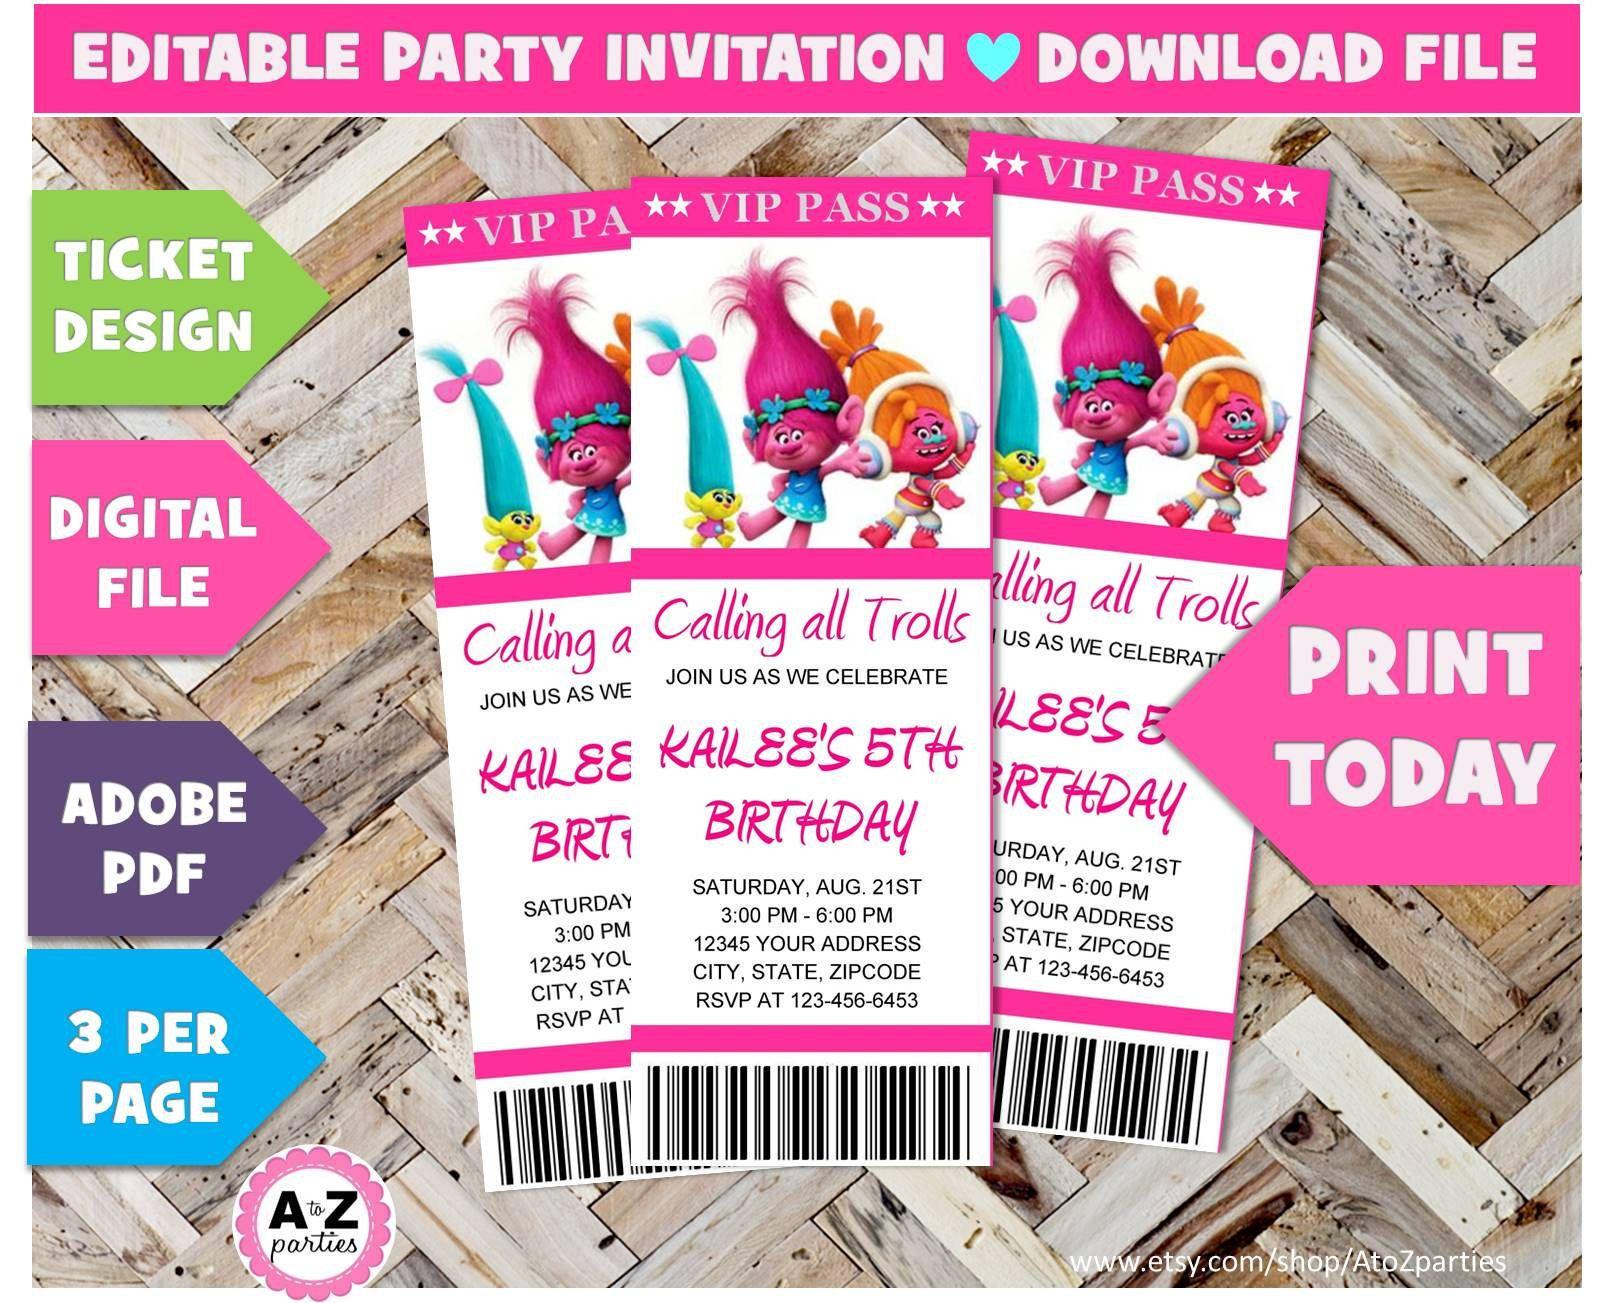 395 trolls birthday invitation editable trolls edit with adobe 395 trolls birthday invitation editable trolls edit with adobe trolls party stopboris Gallery